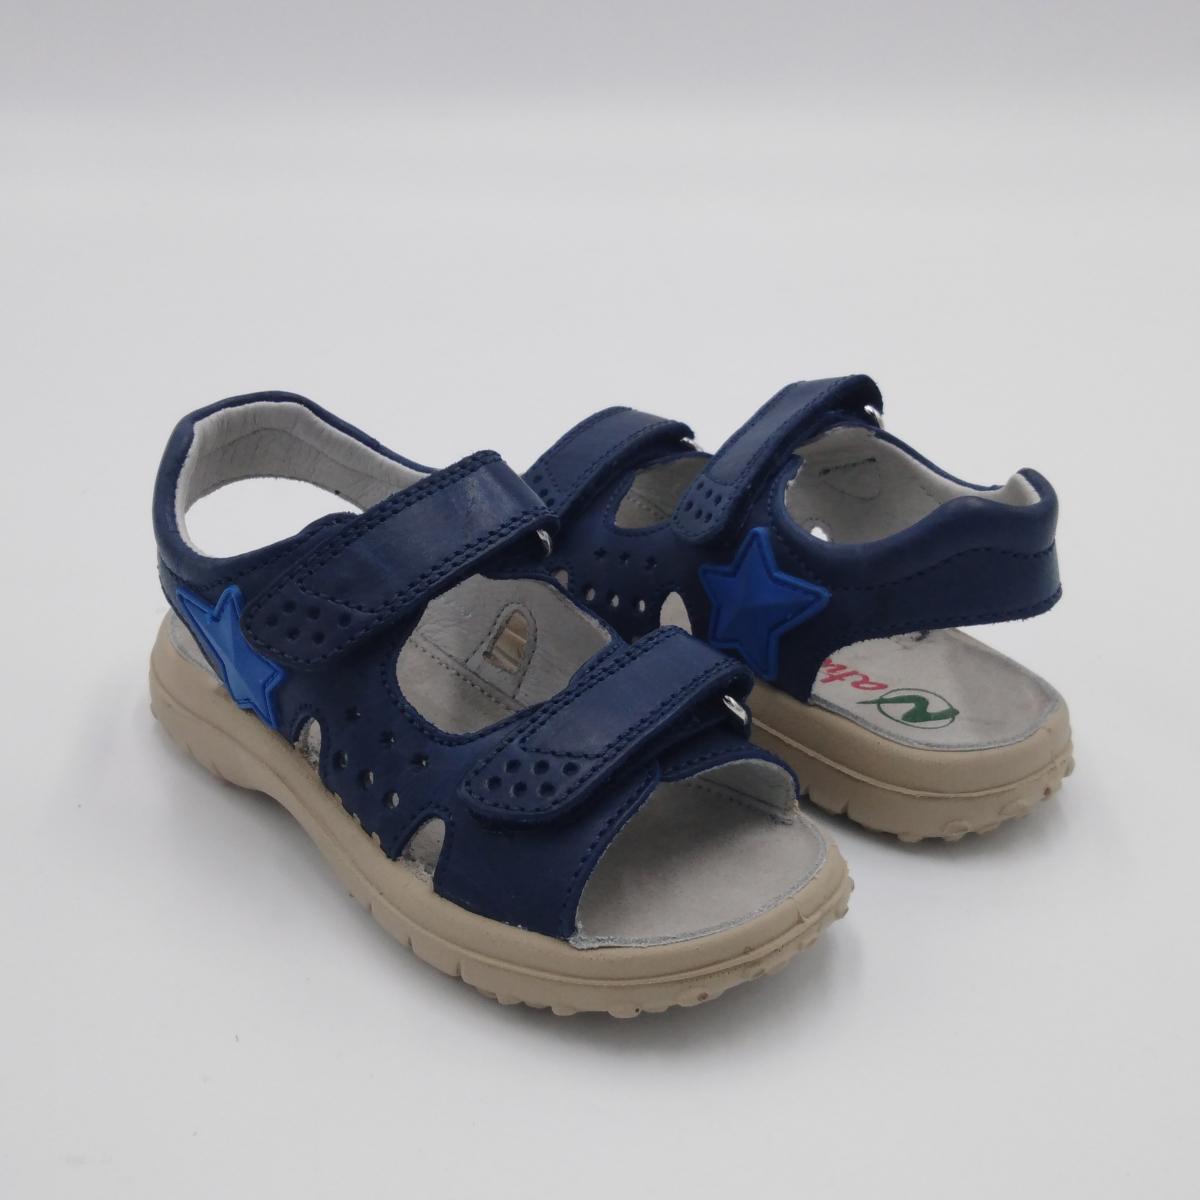 Naturino - Dock sandalo...